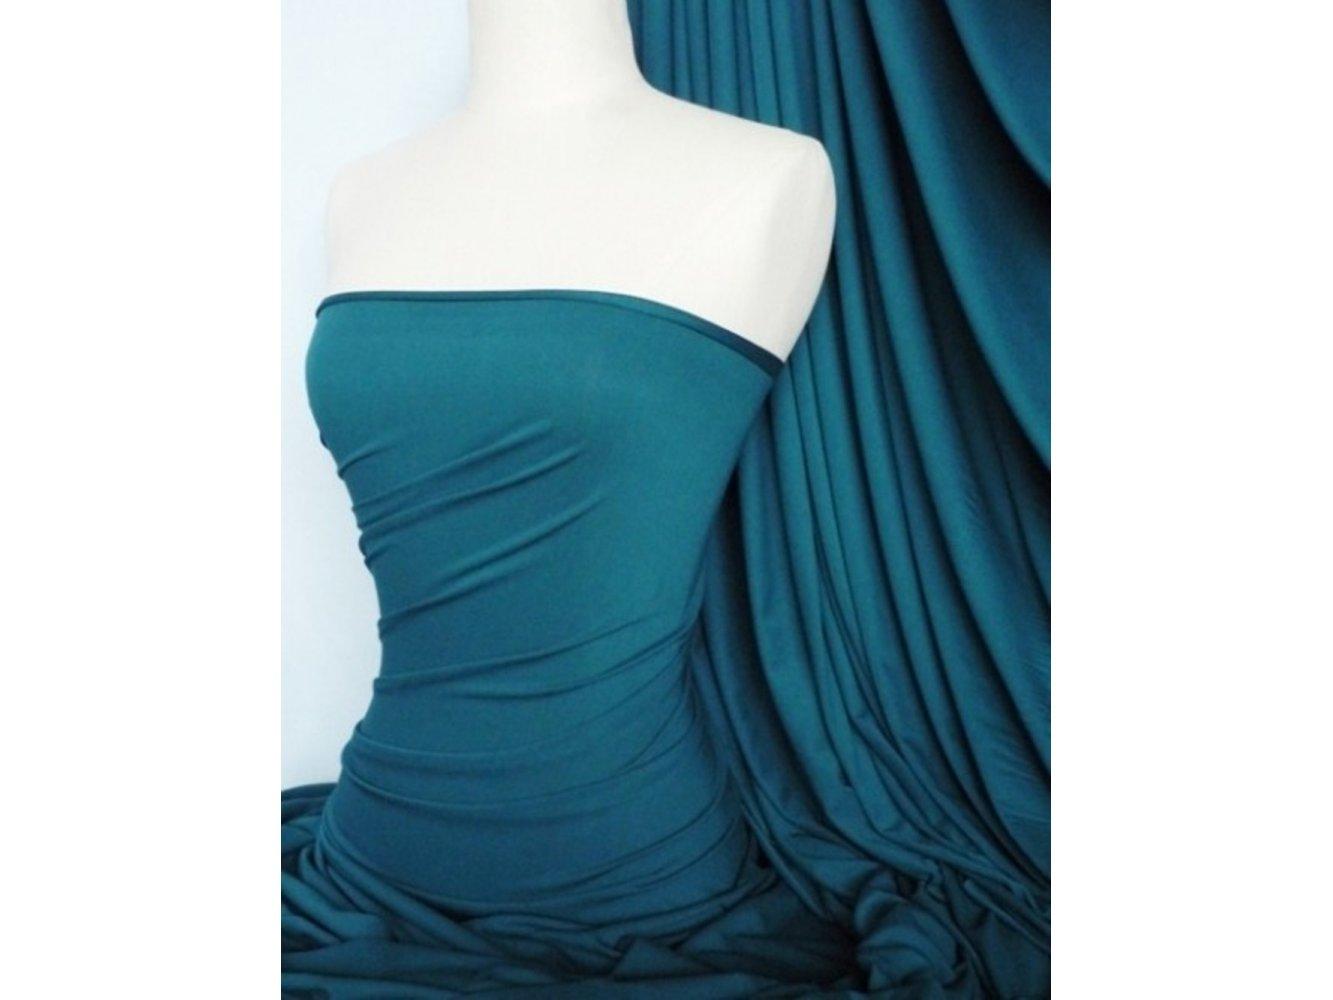 Viscose Cotton Stretch Lycra Fabric- Teal Q300 TL